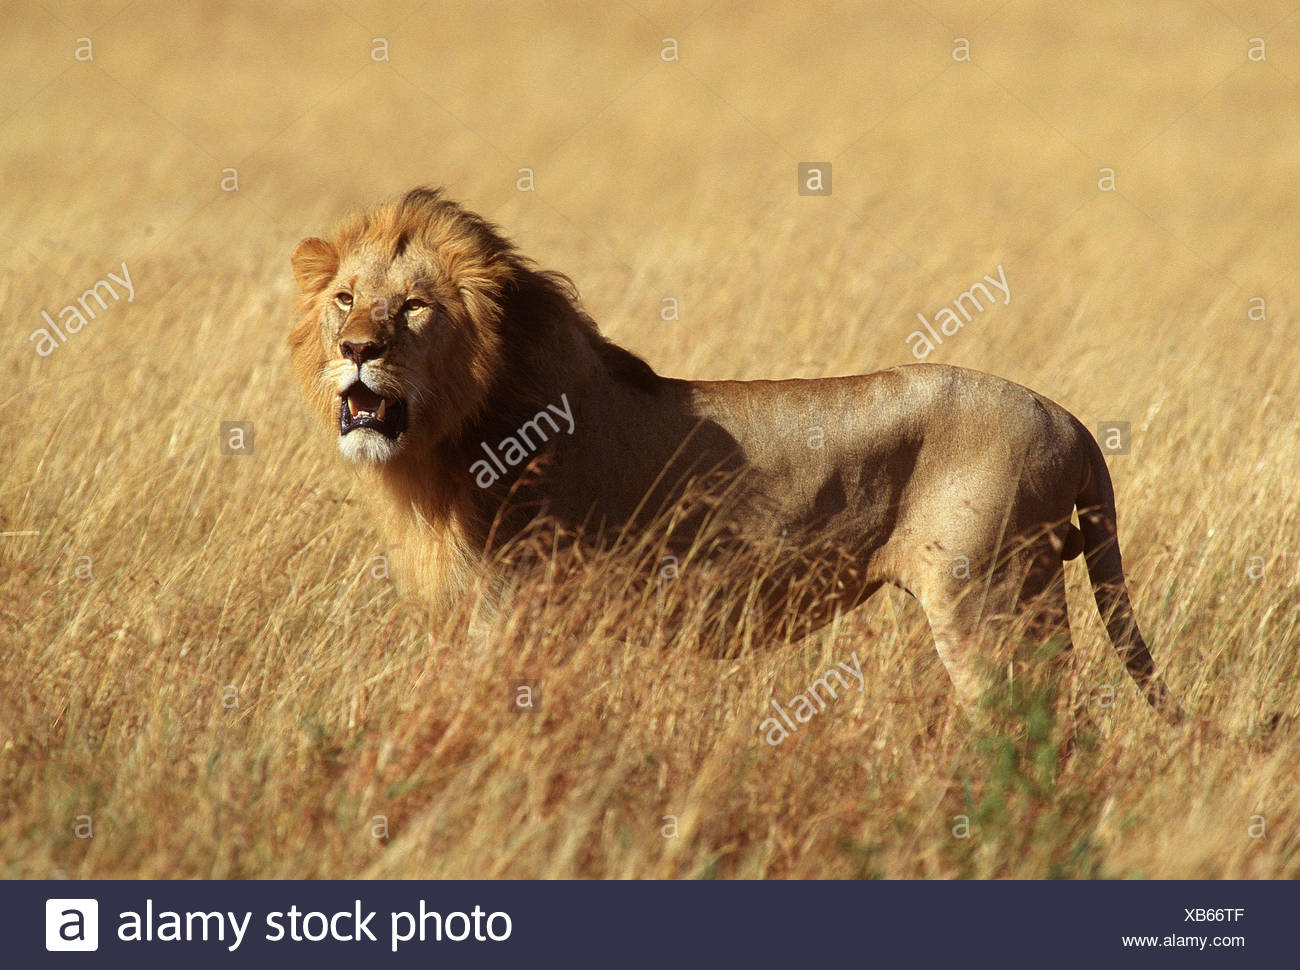 León, Serengeti, África Imagen De Stock